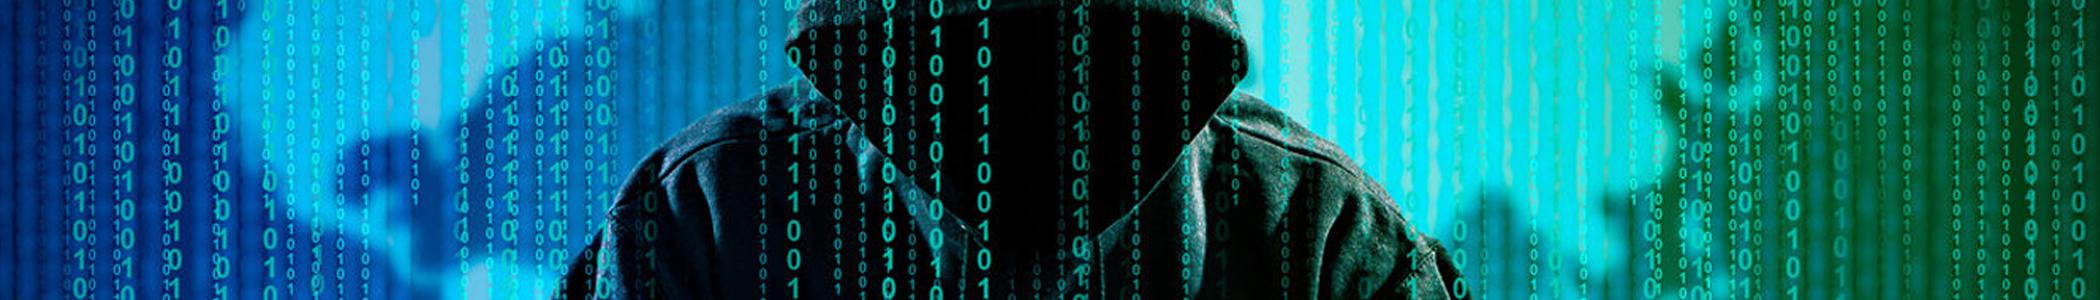 Cybercrime-eBook